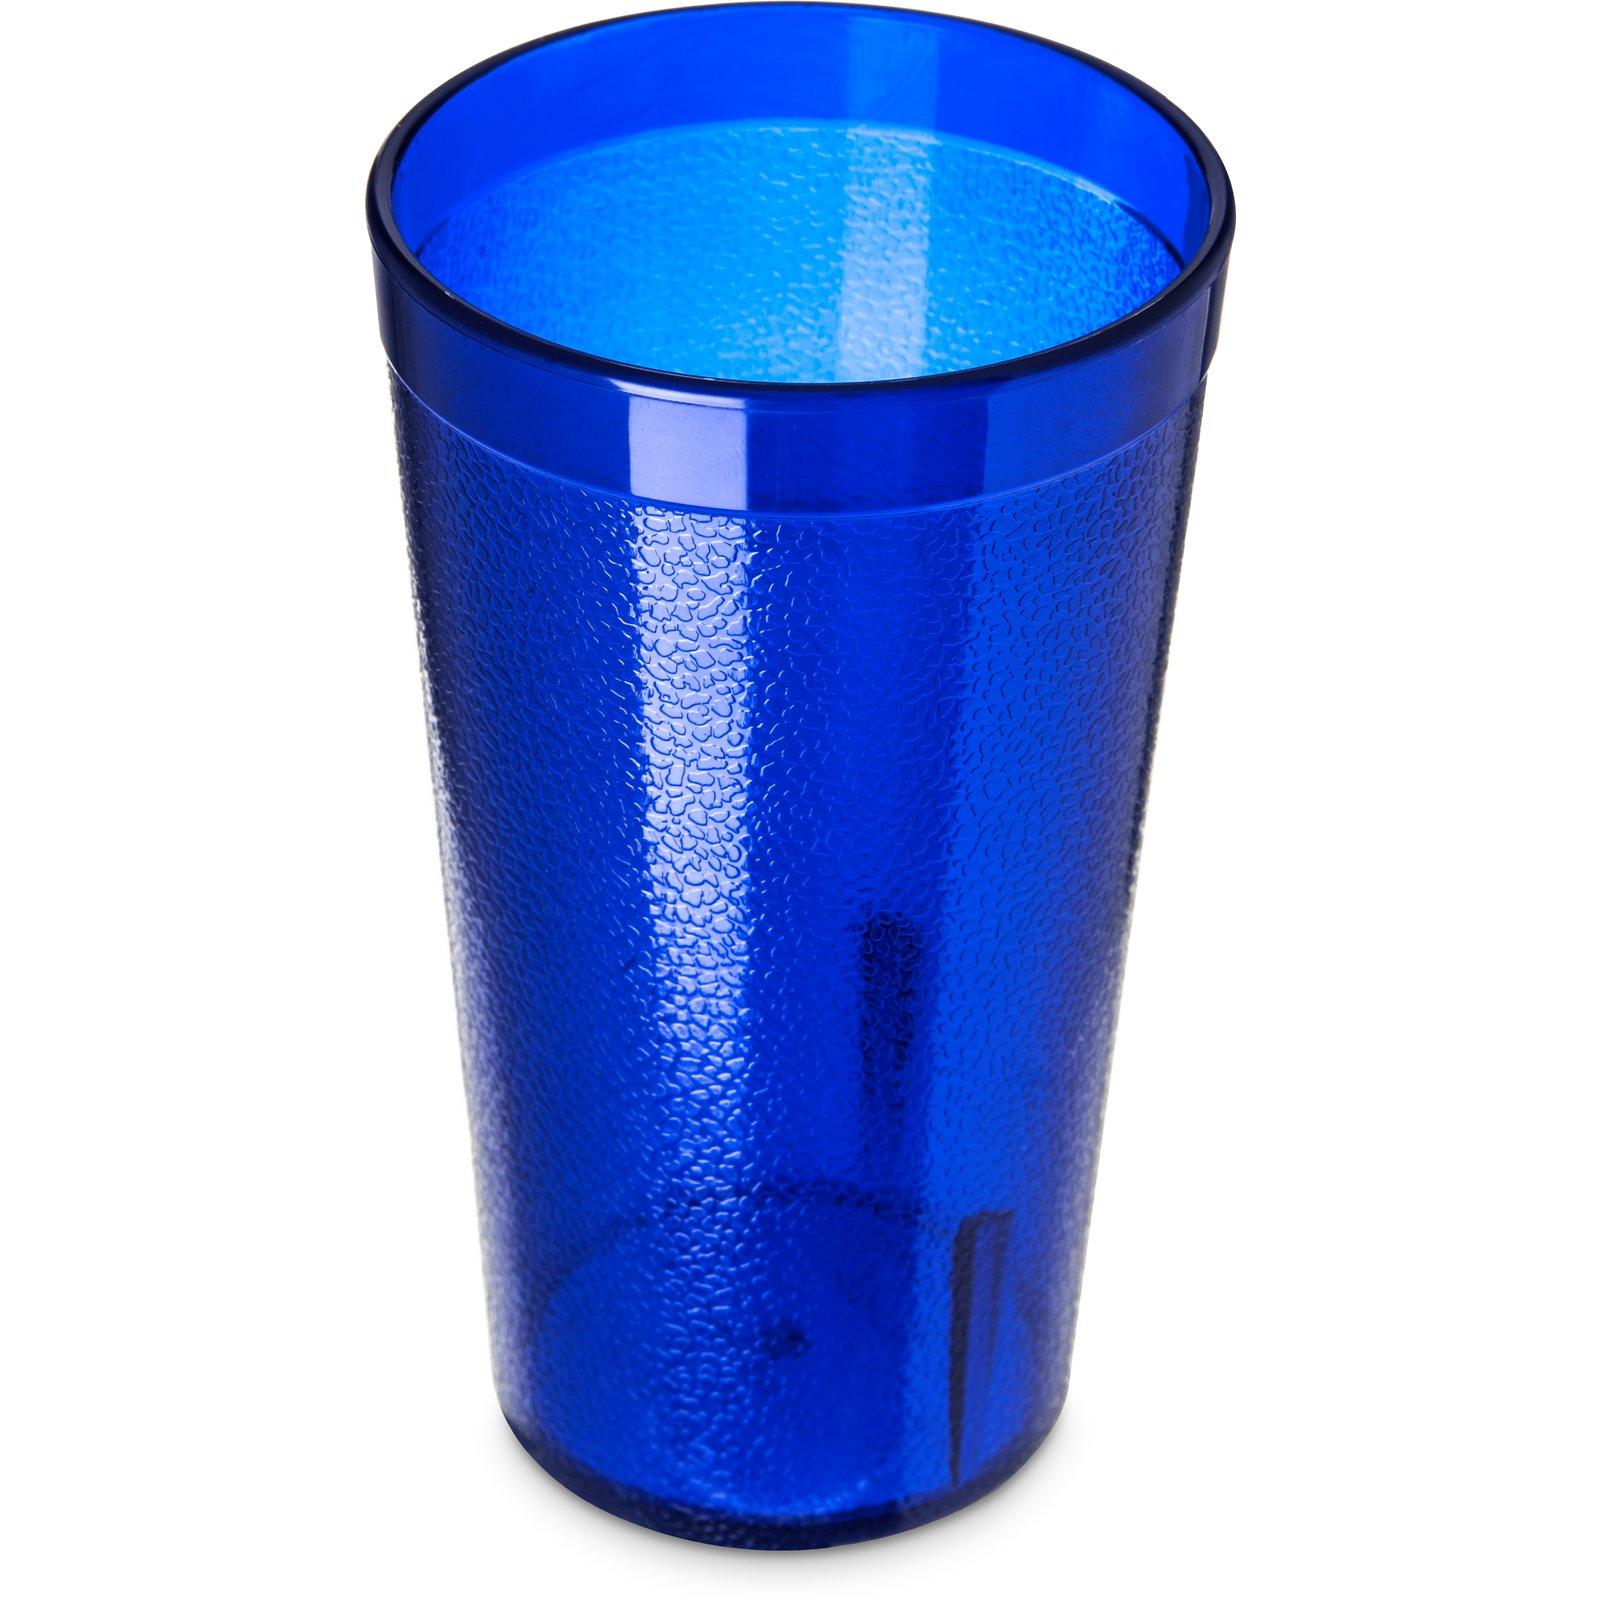 521247 Stackable San Plastic Tumbler 12 Oz Royal Blue Carlisle Foodservice Products